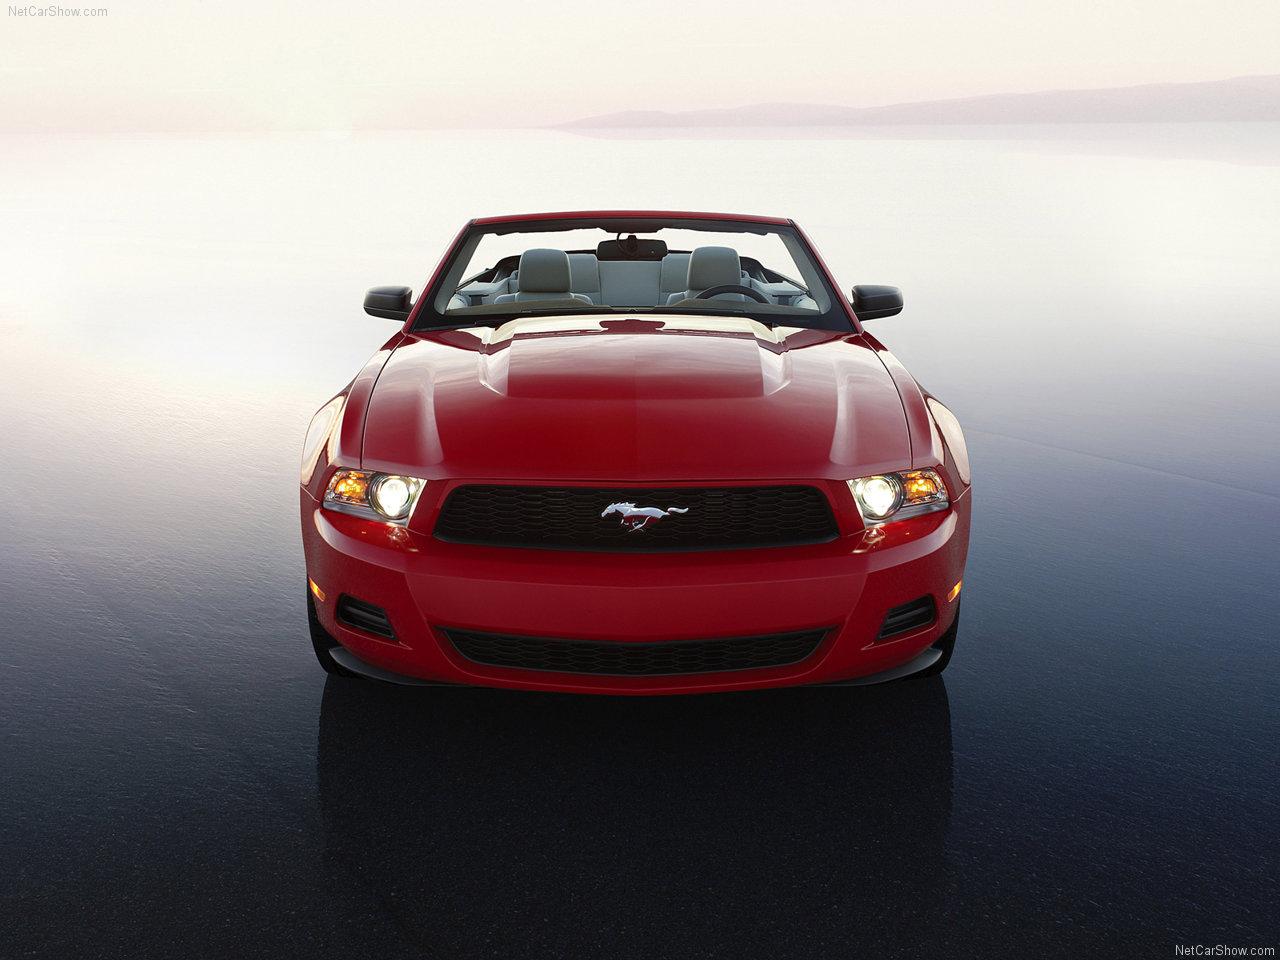 http://2.bp.blogspot.com/-9yQa01OpHe4/TXNtxFGMh7I/AAAAAAAADF8/Iy1tRxO9wC8/s1600/Ford-Mustang_Convertible_2010_1280x960_wallpaper_08.jpg